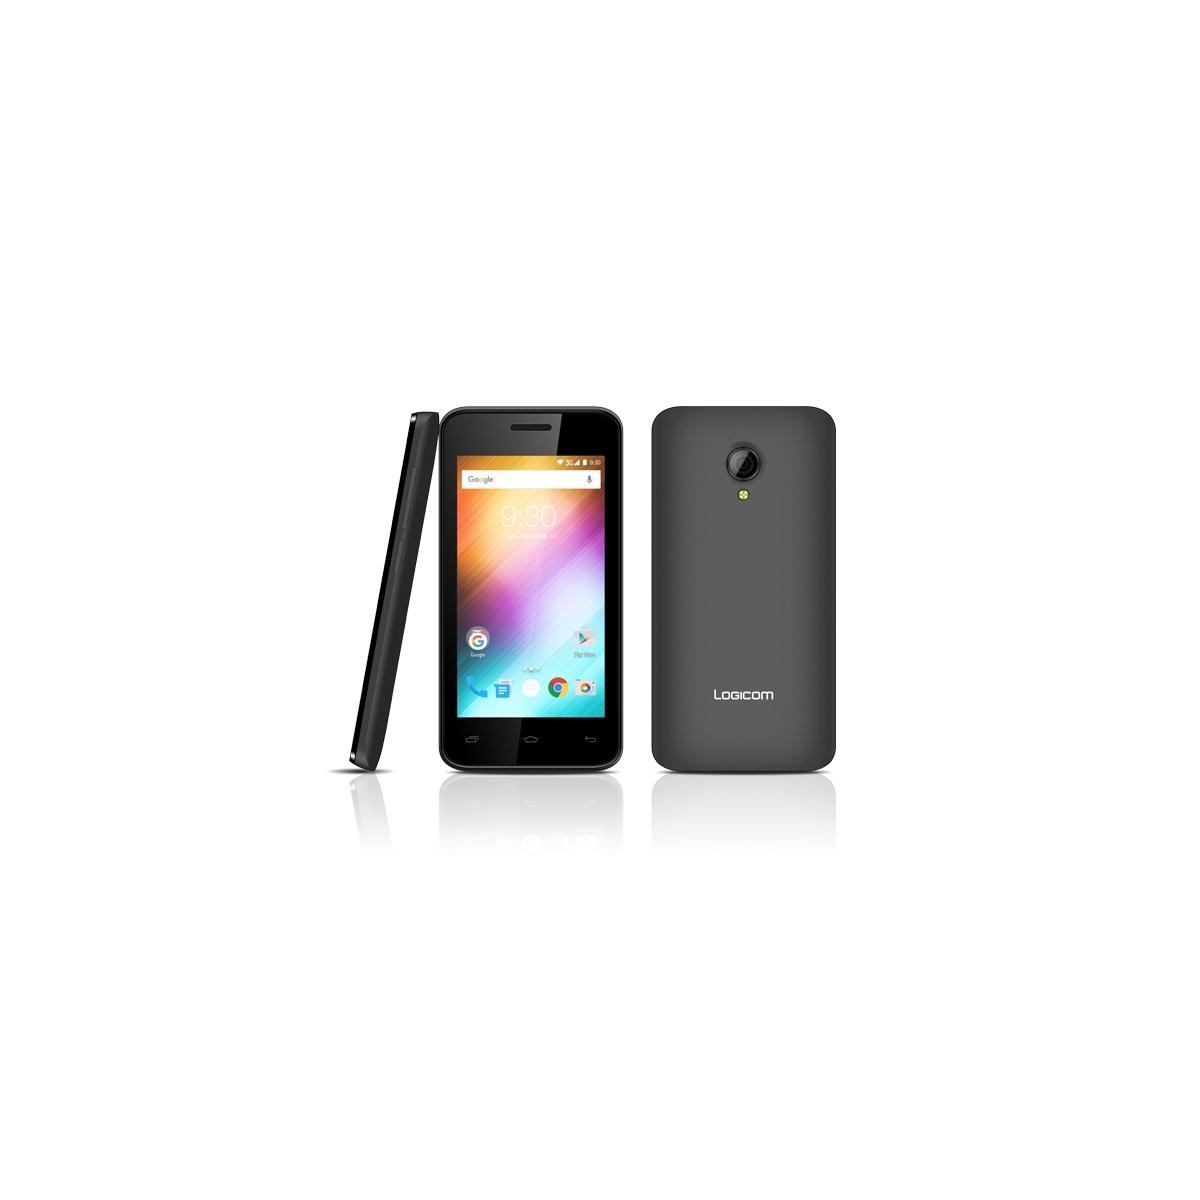 smartphone 4 39 39 quadcore 4go google play l. Black Bedroom Furniture Sets. Home Design Ideas